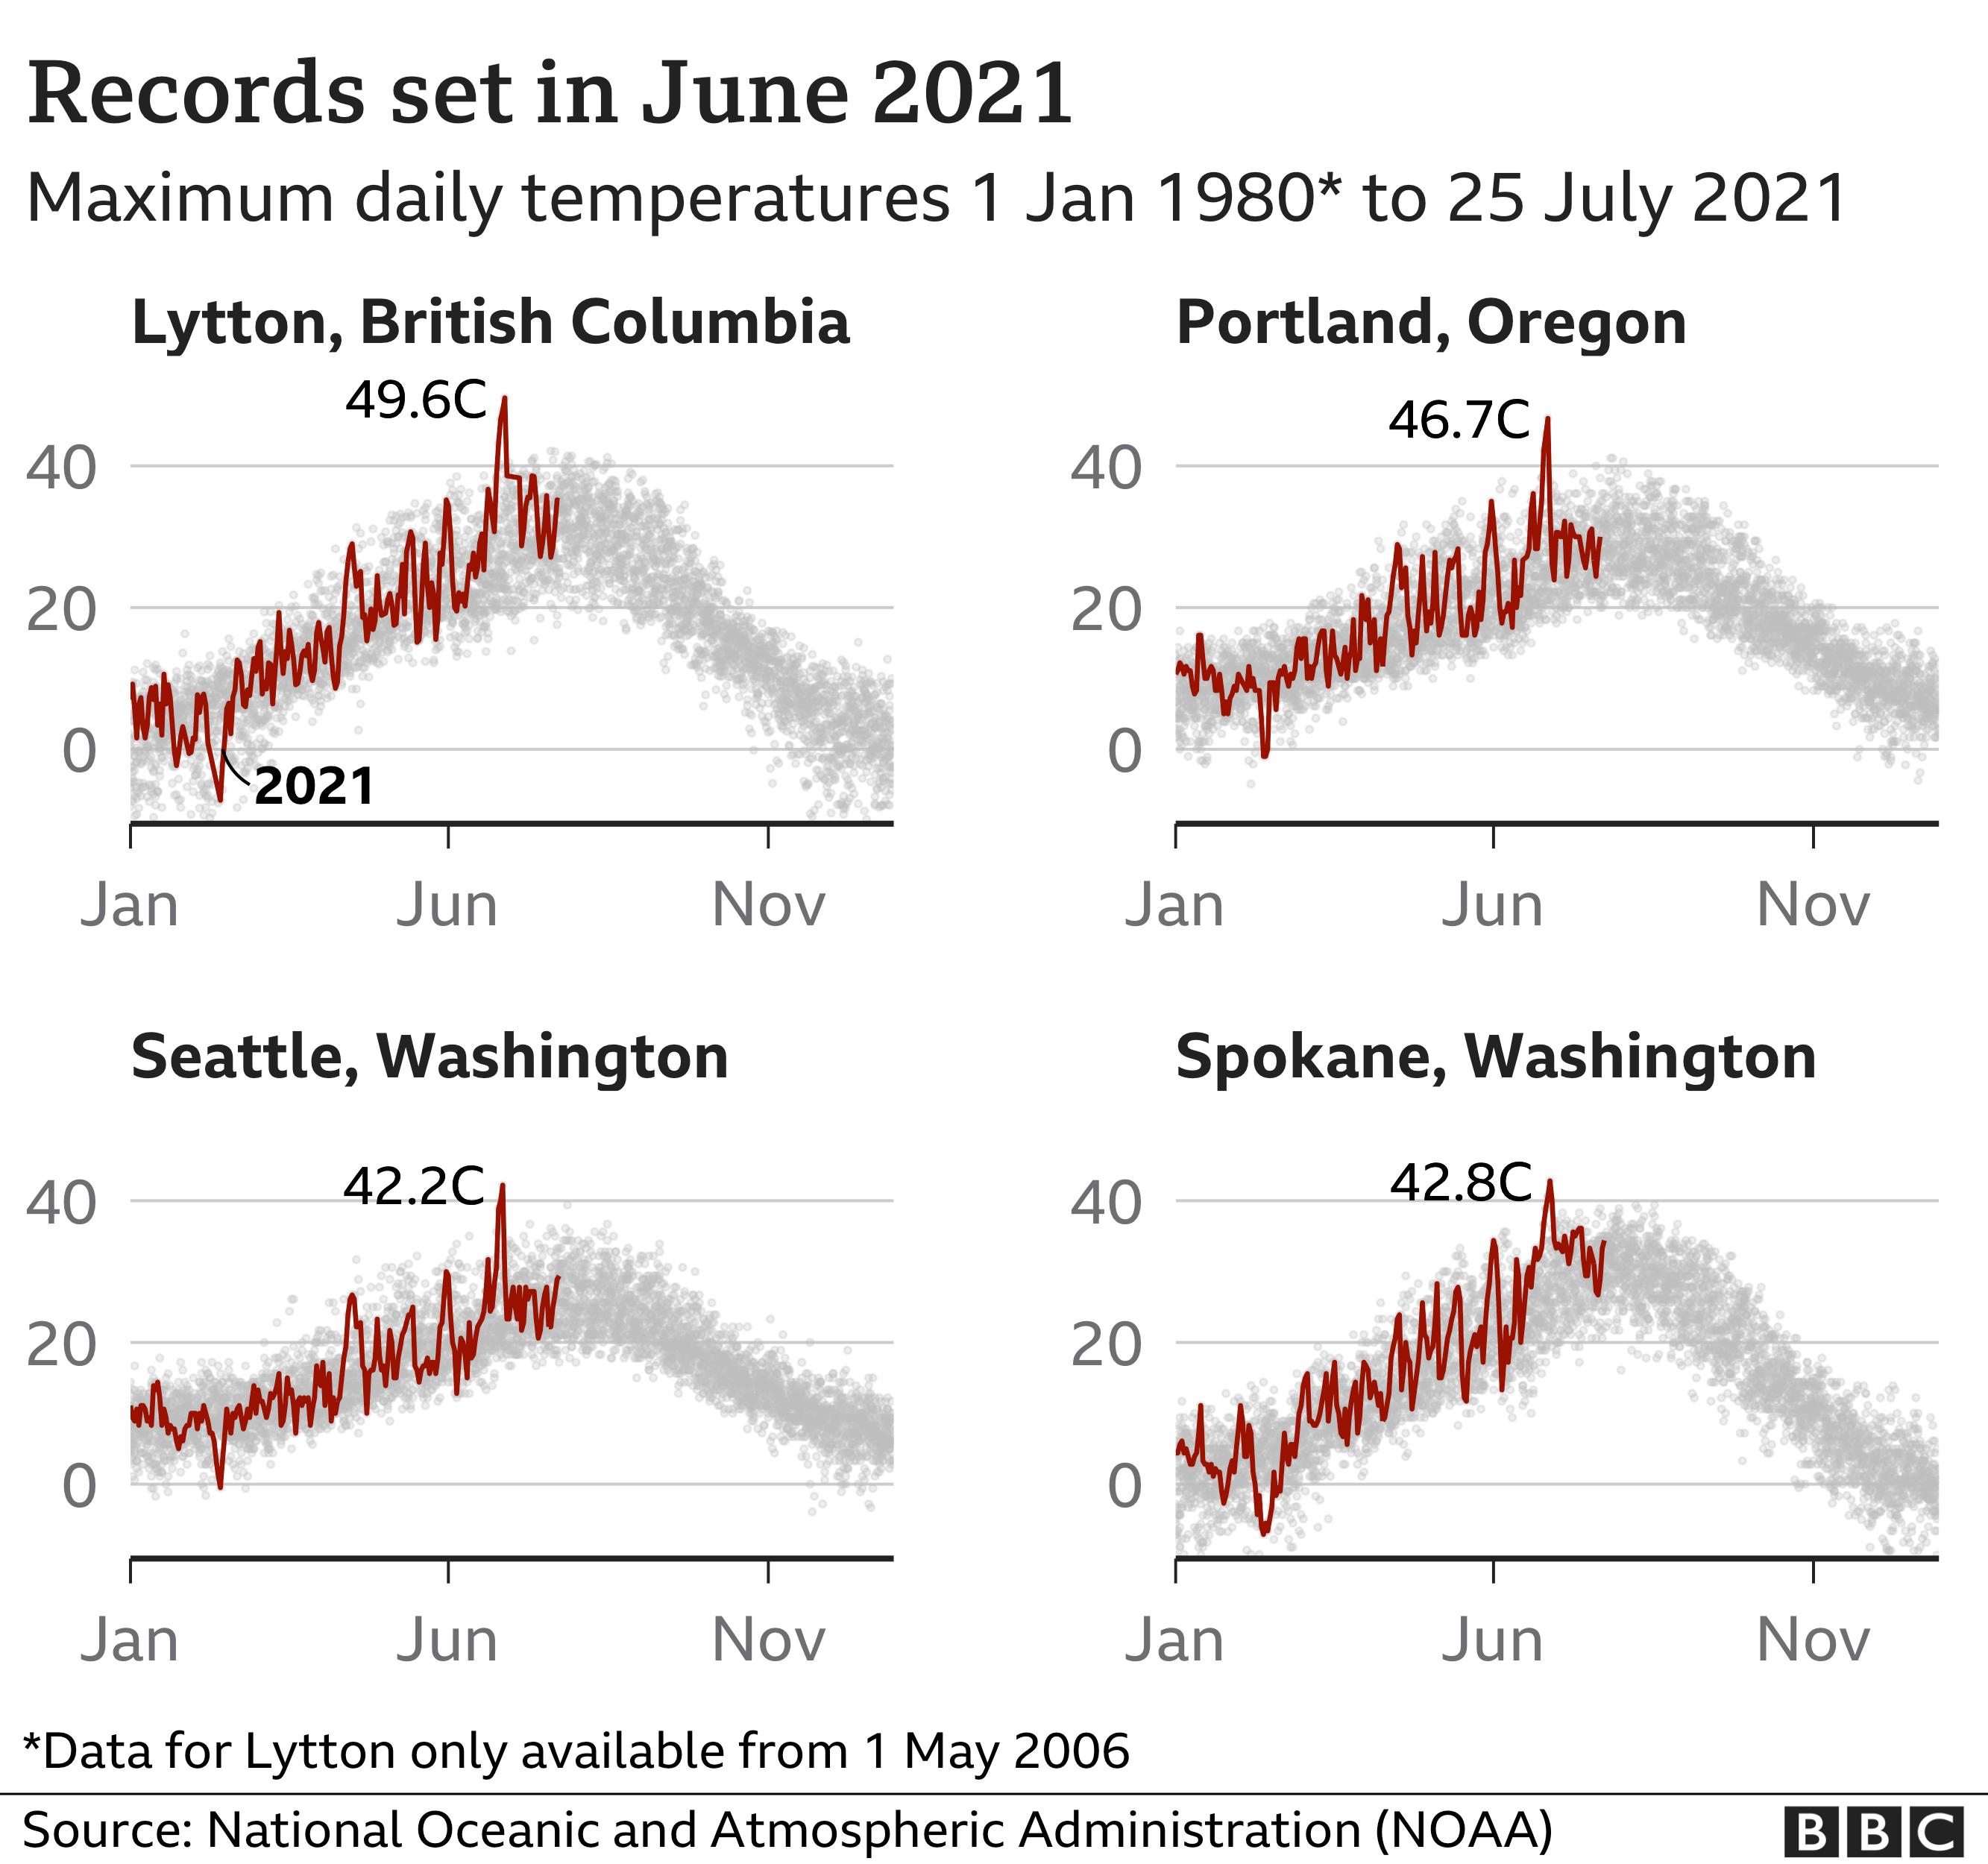 Charts showing record temperatures set in June 2021: Lytton, British Columbia 49.6C; Portland, Oregon 46.7C; Seattle, Washington 42.2C; Spokane, Washington 42.8C